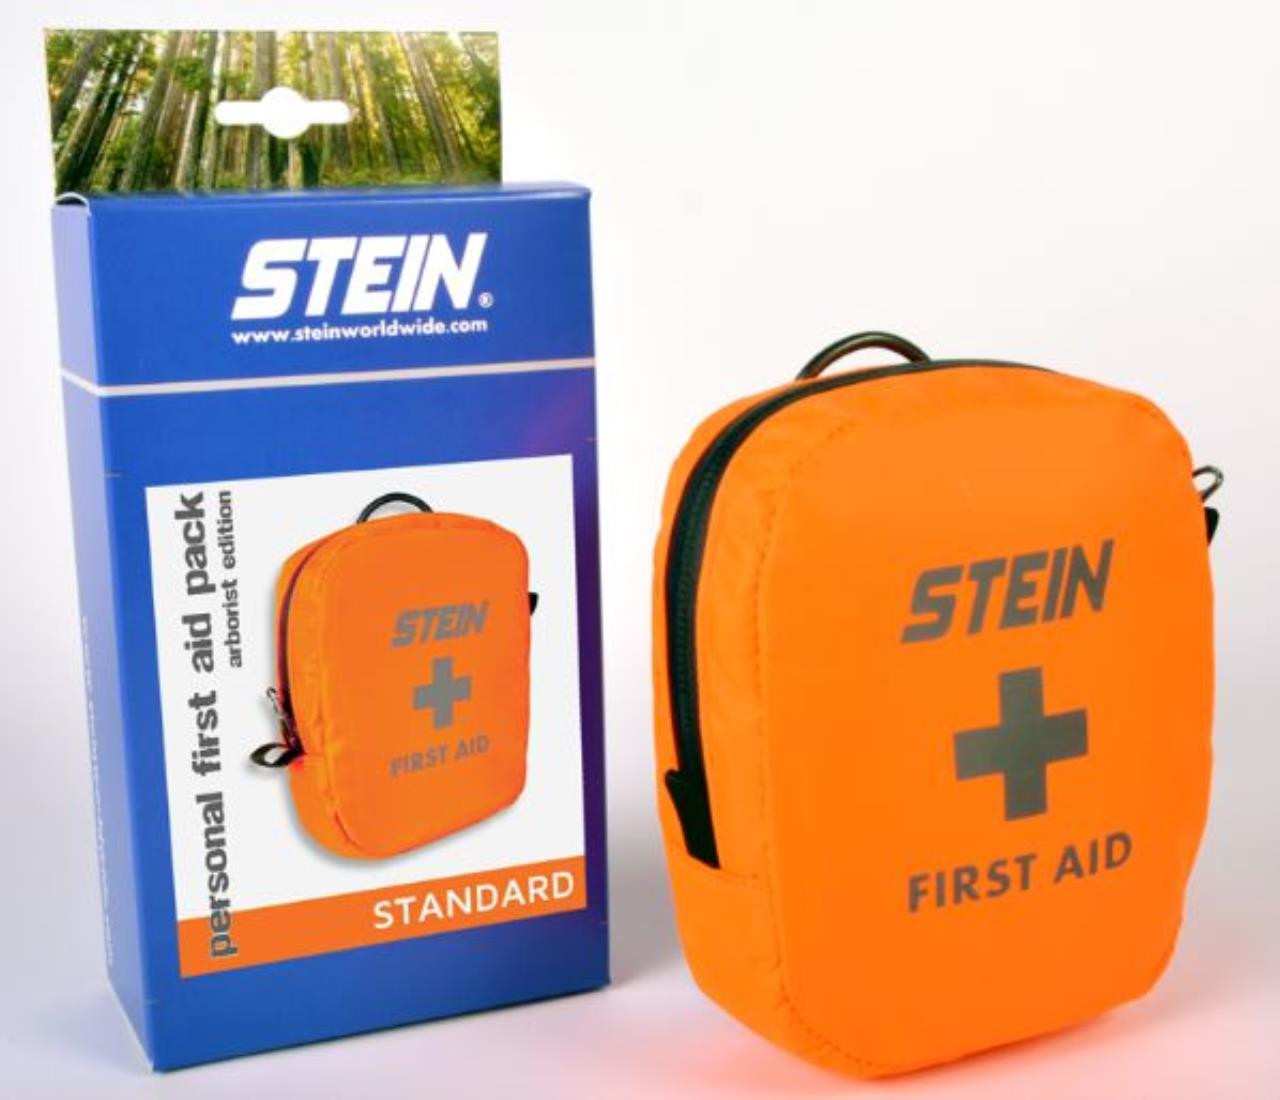 STEIN FIRST AID POUCH